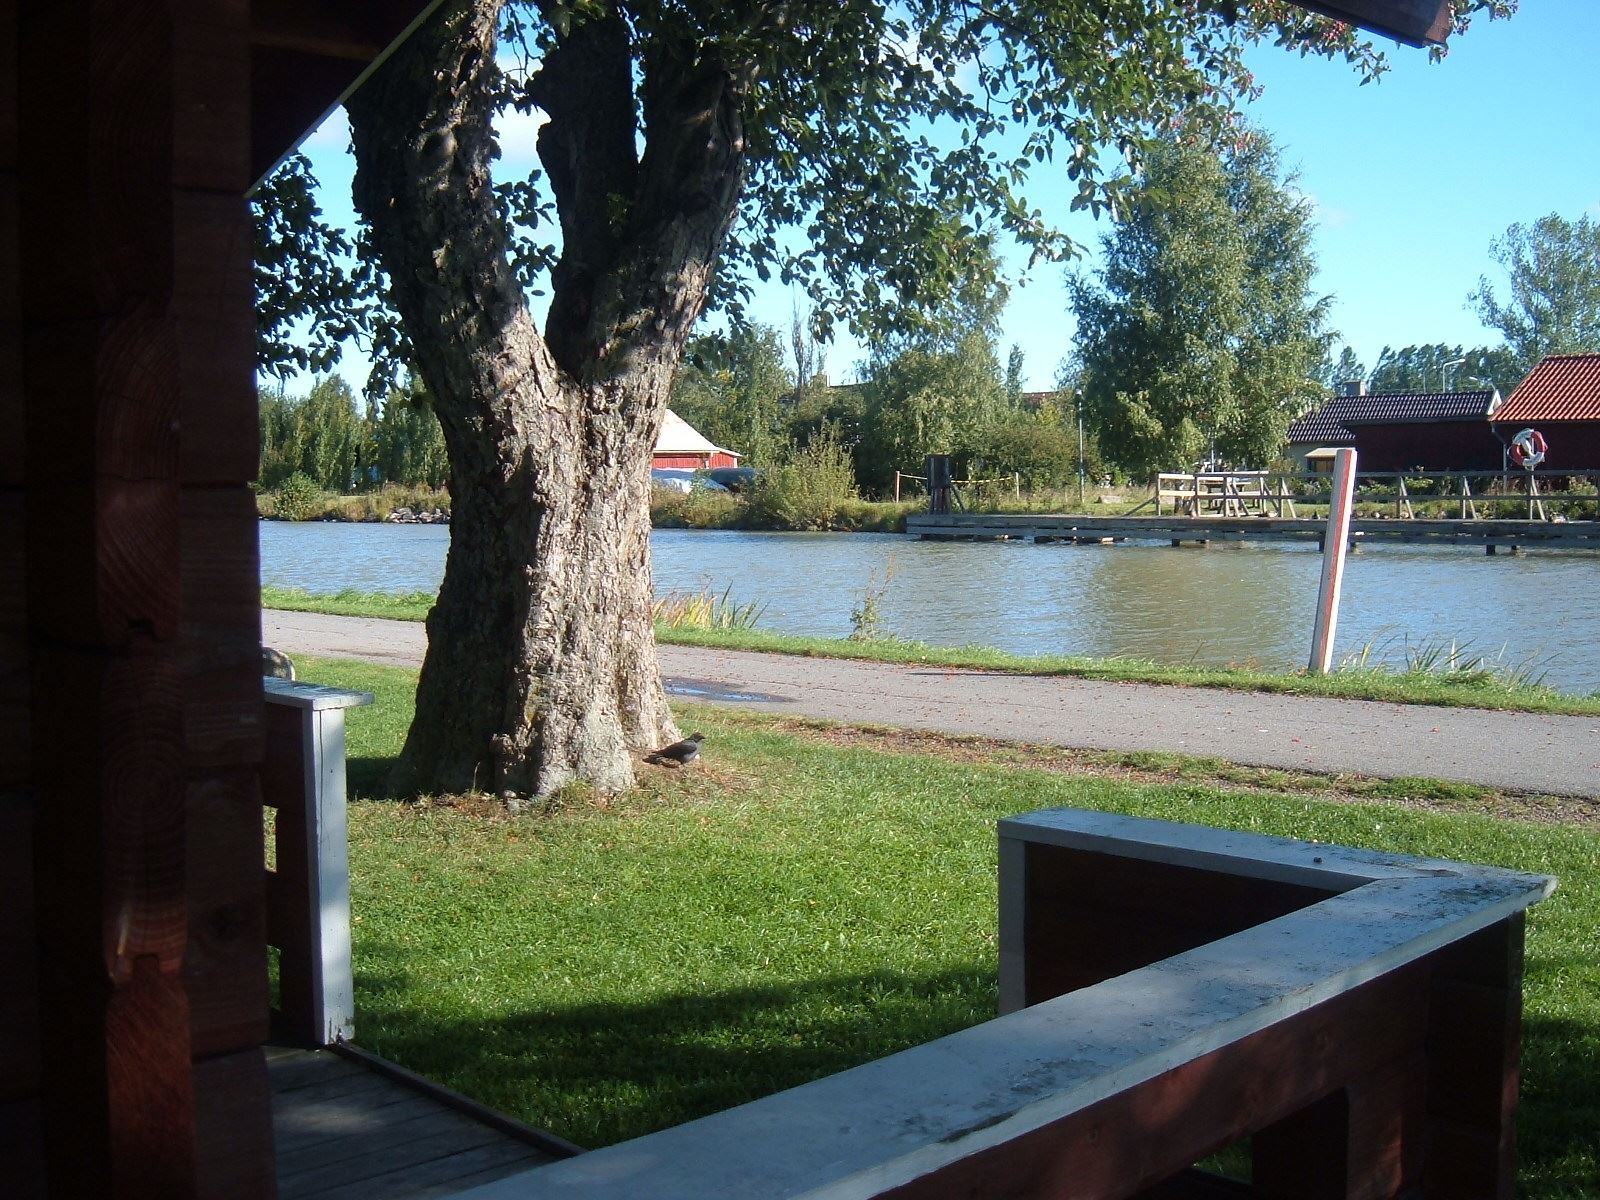 Jonsboda Cafe & Camping Göta kanal